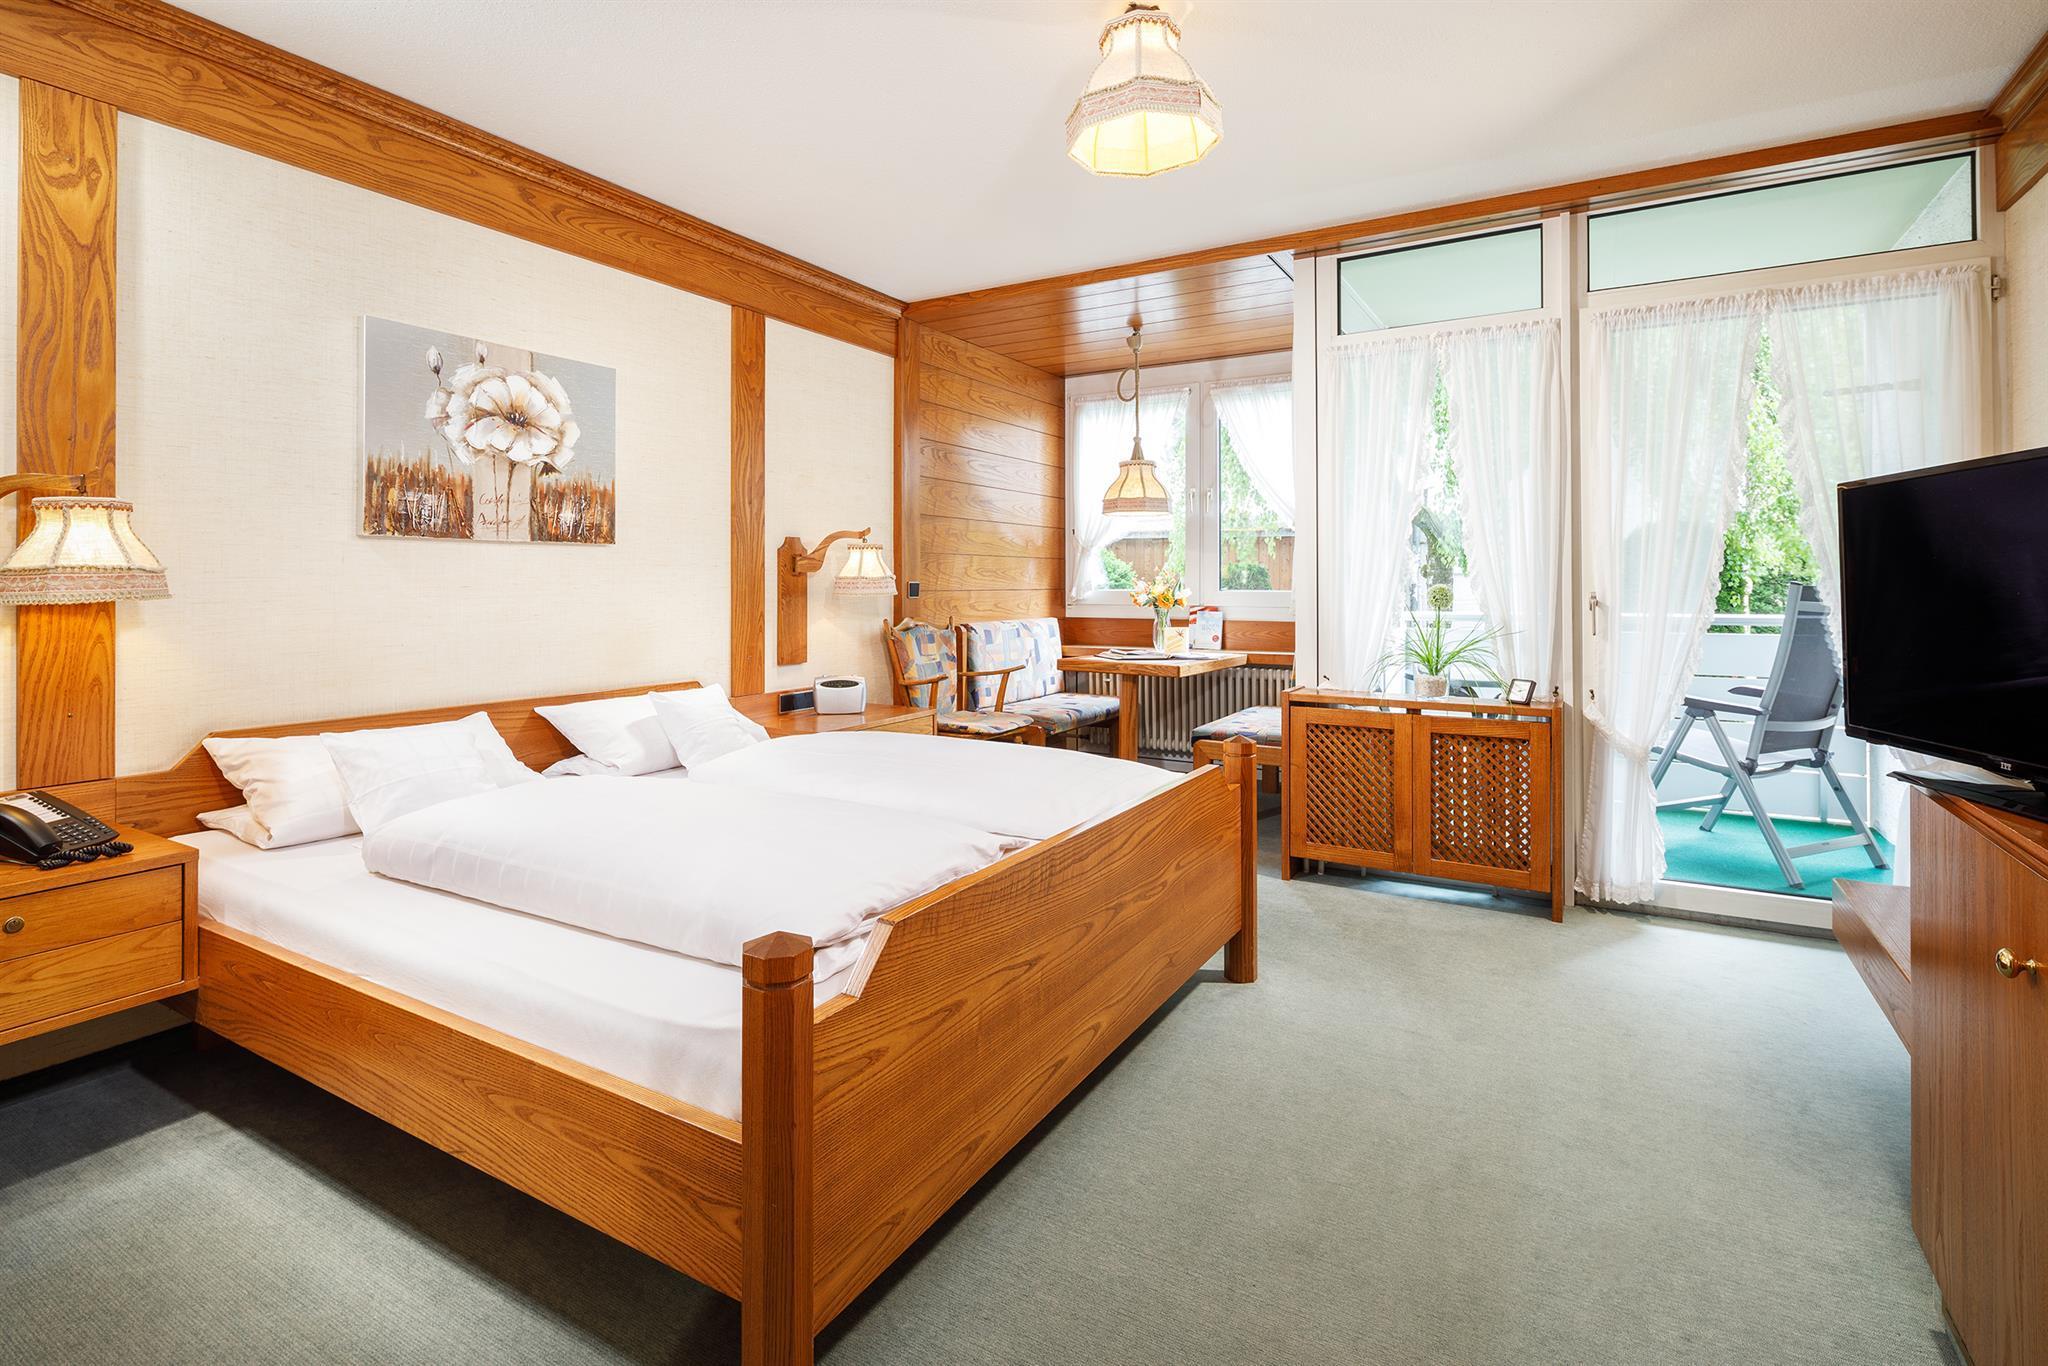 Hotel Steinle Doppelzimmer standard plus